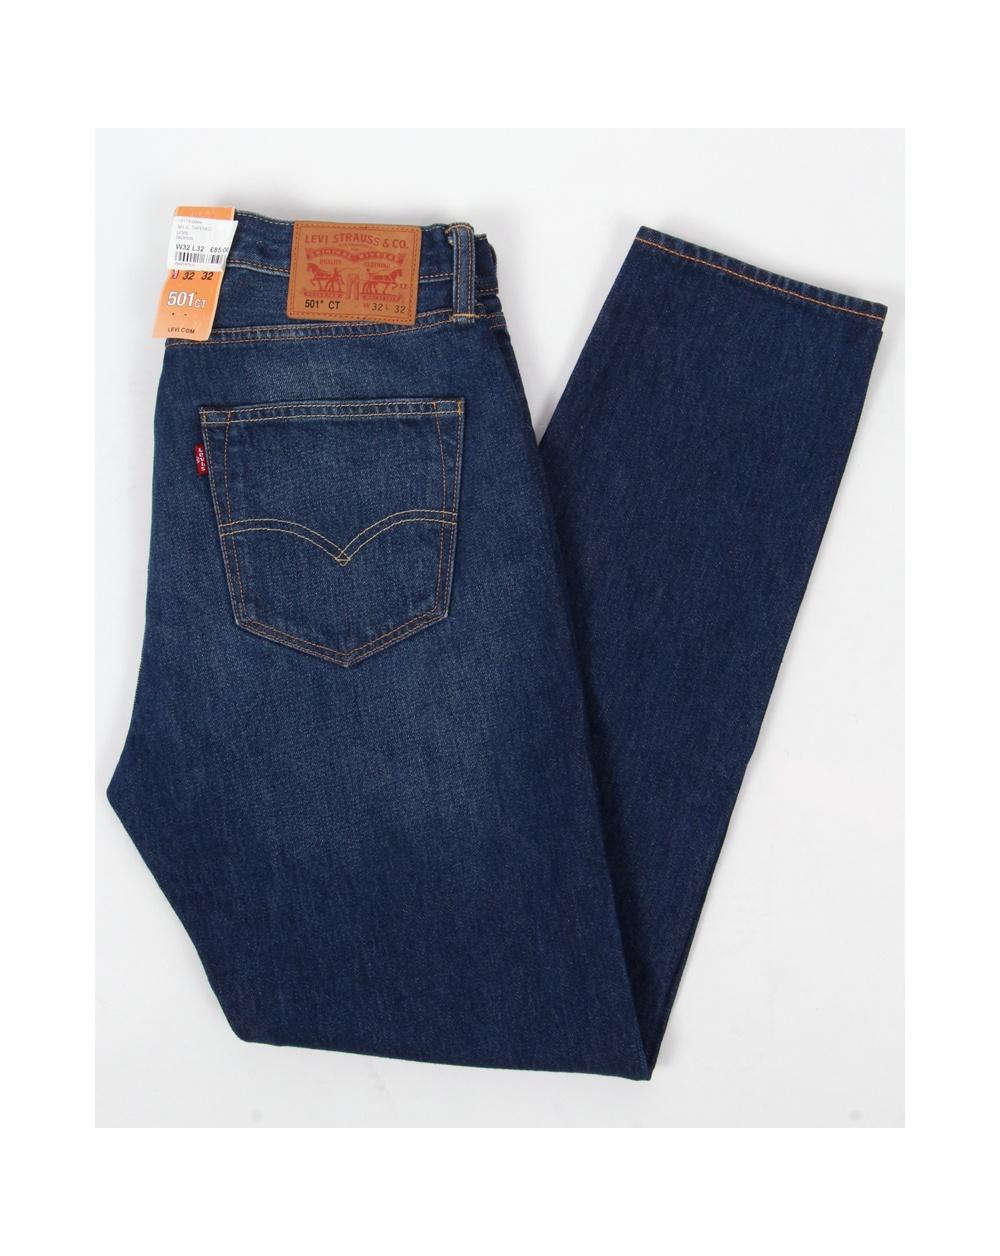 4ce29ce9 Levis 501ct Tapered Jeans Dalston,denim,mens,slim